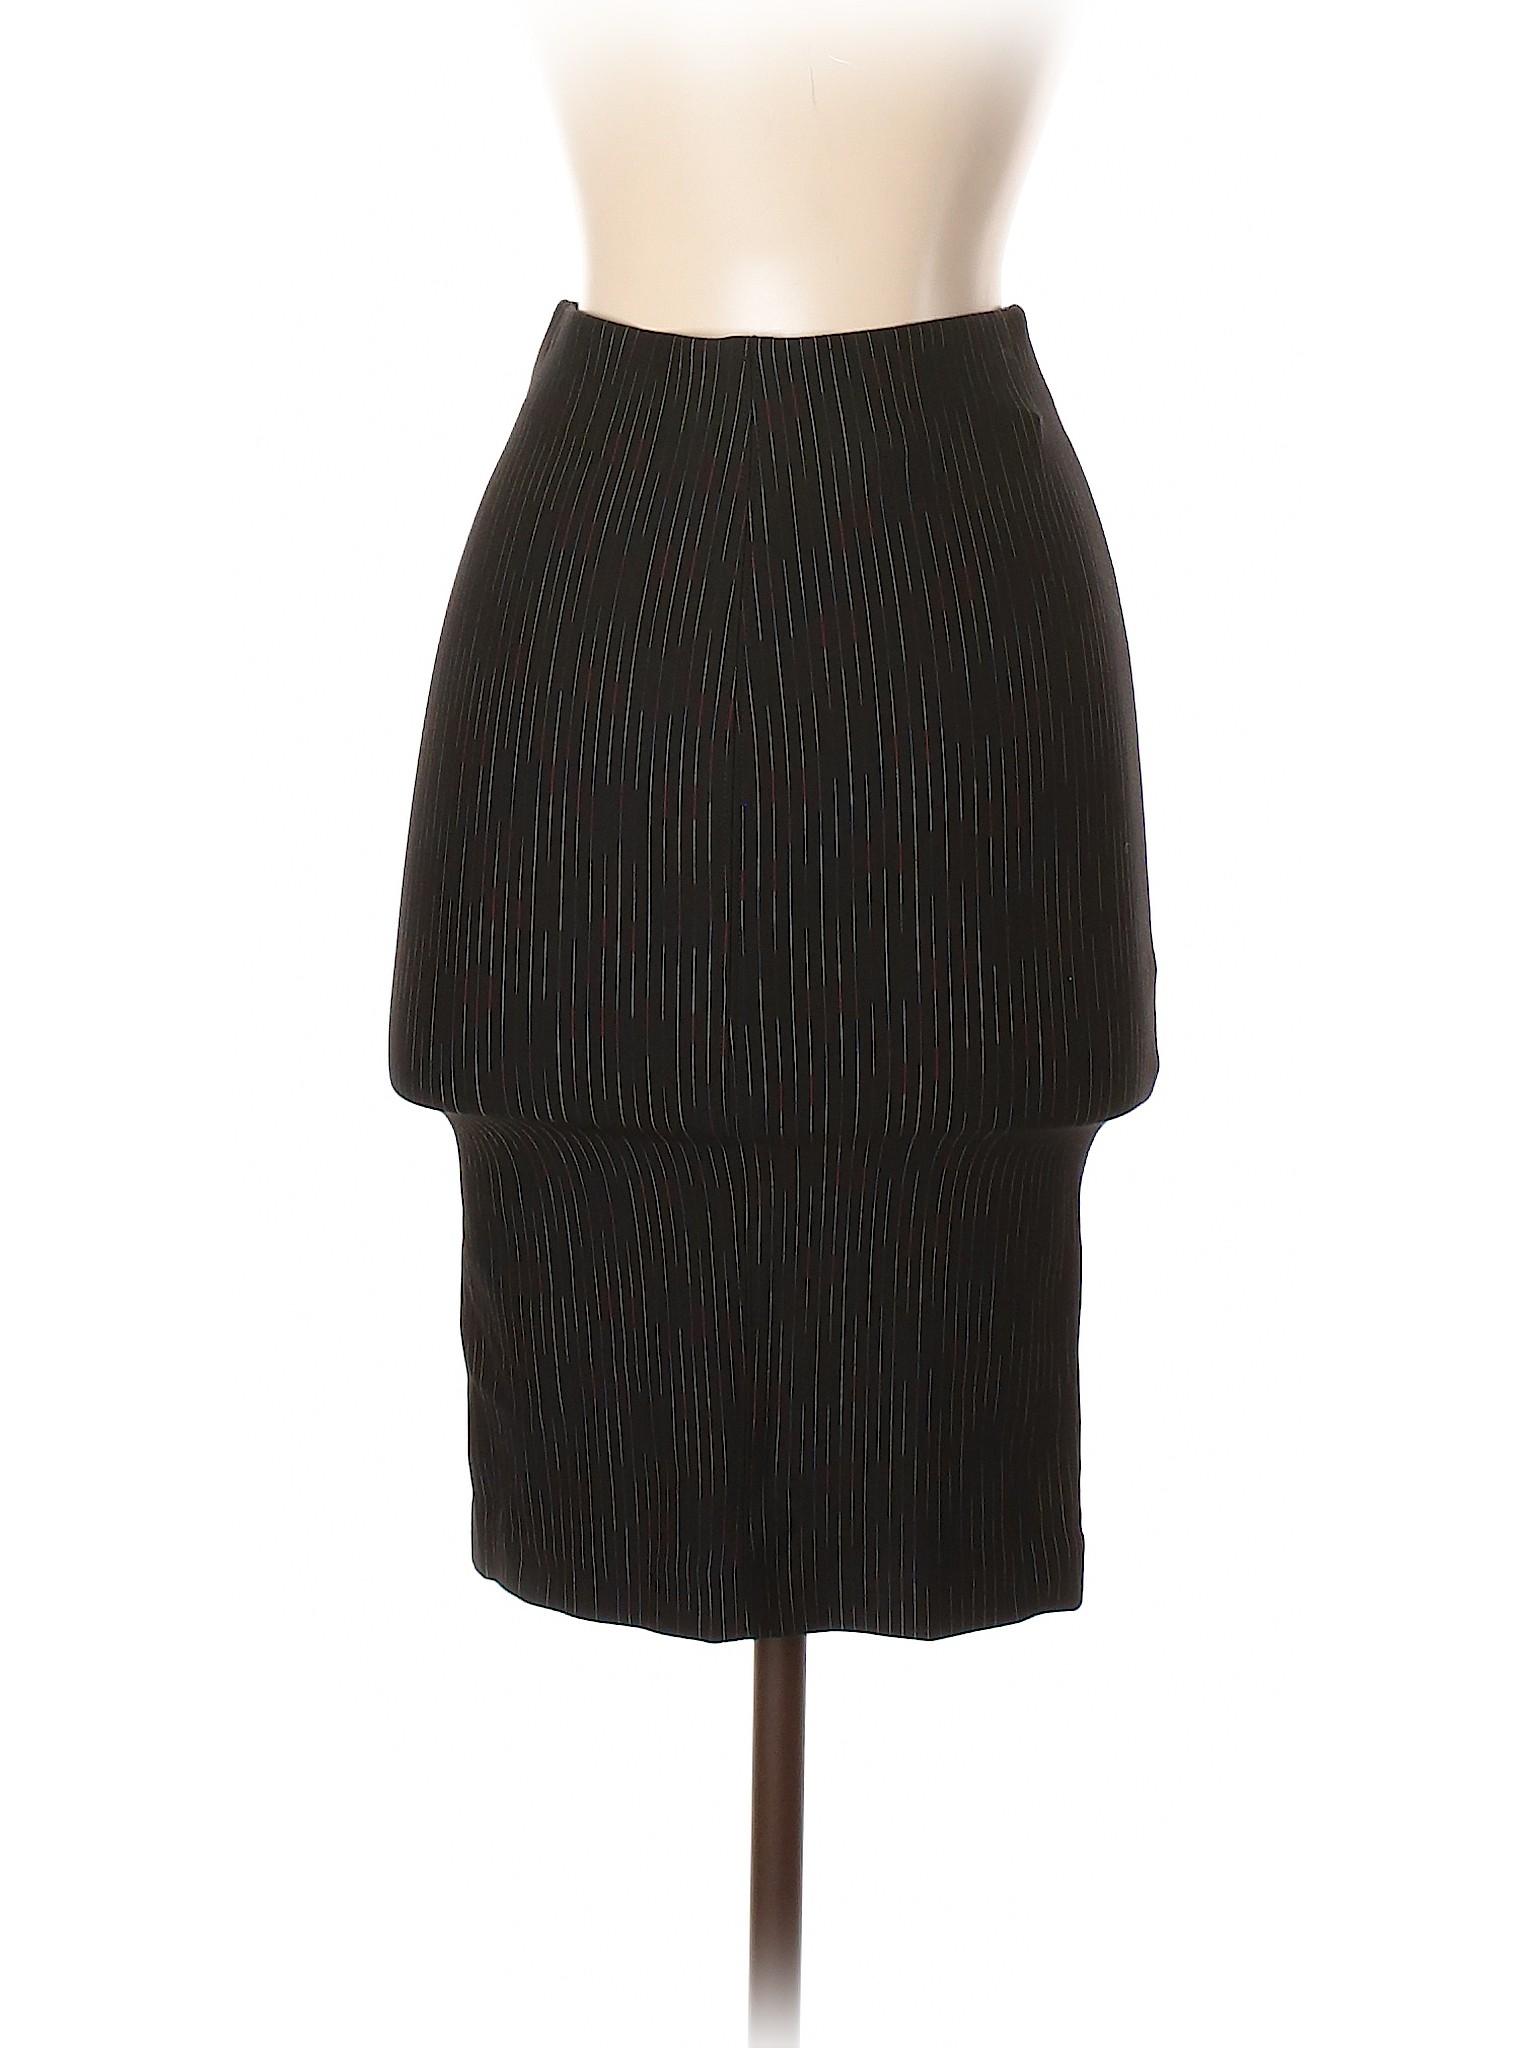 Skirt Casual Skirt Skirt Casual Boutique Casual Boutique Boutique Boutique Casual Rrrtq